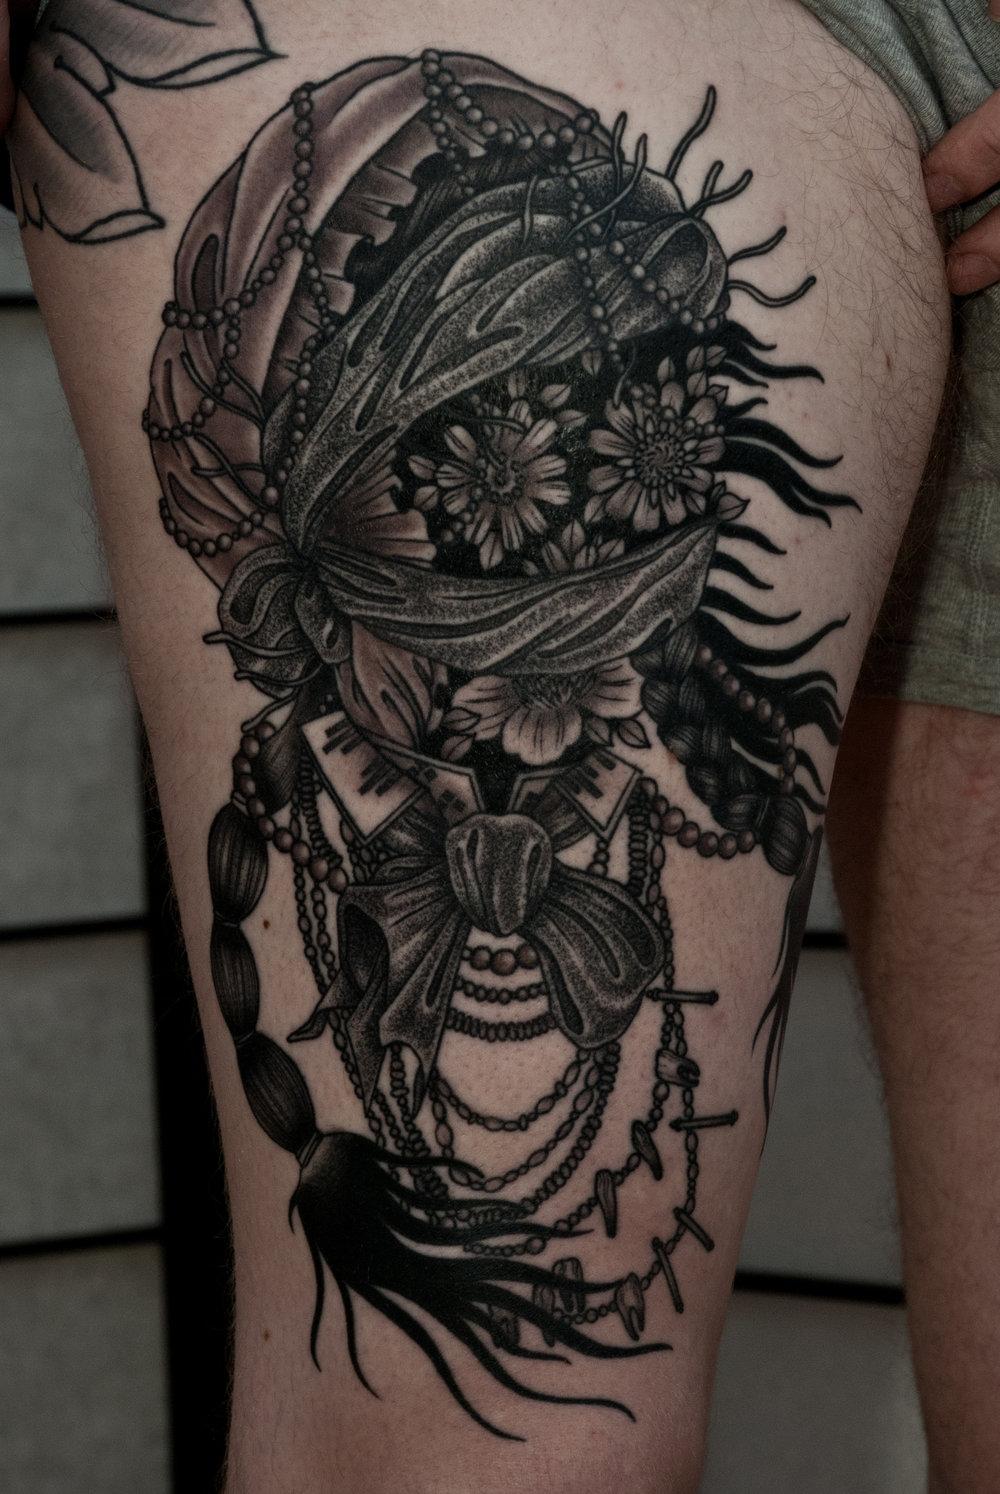 zac_scheinbaum_-_saved_tattoo-reaper-2012_-_2012_-_1-5.jpg